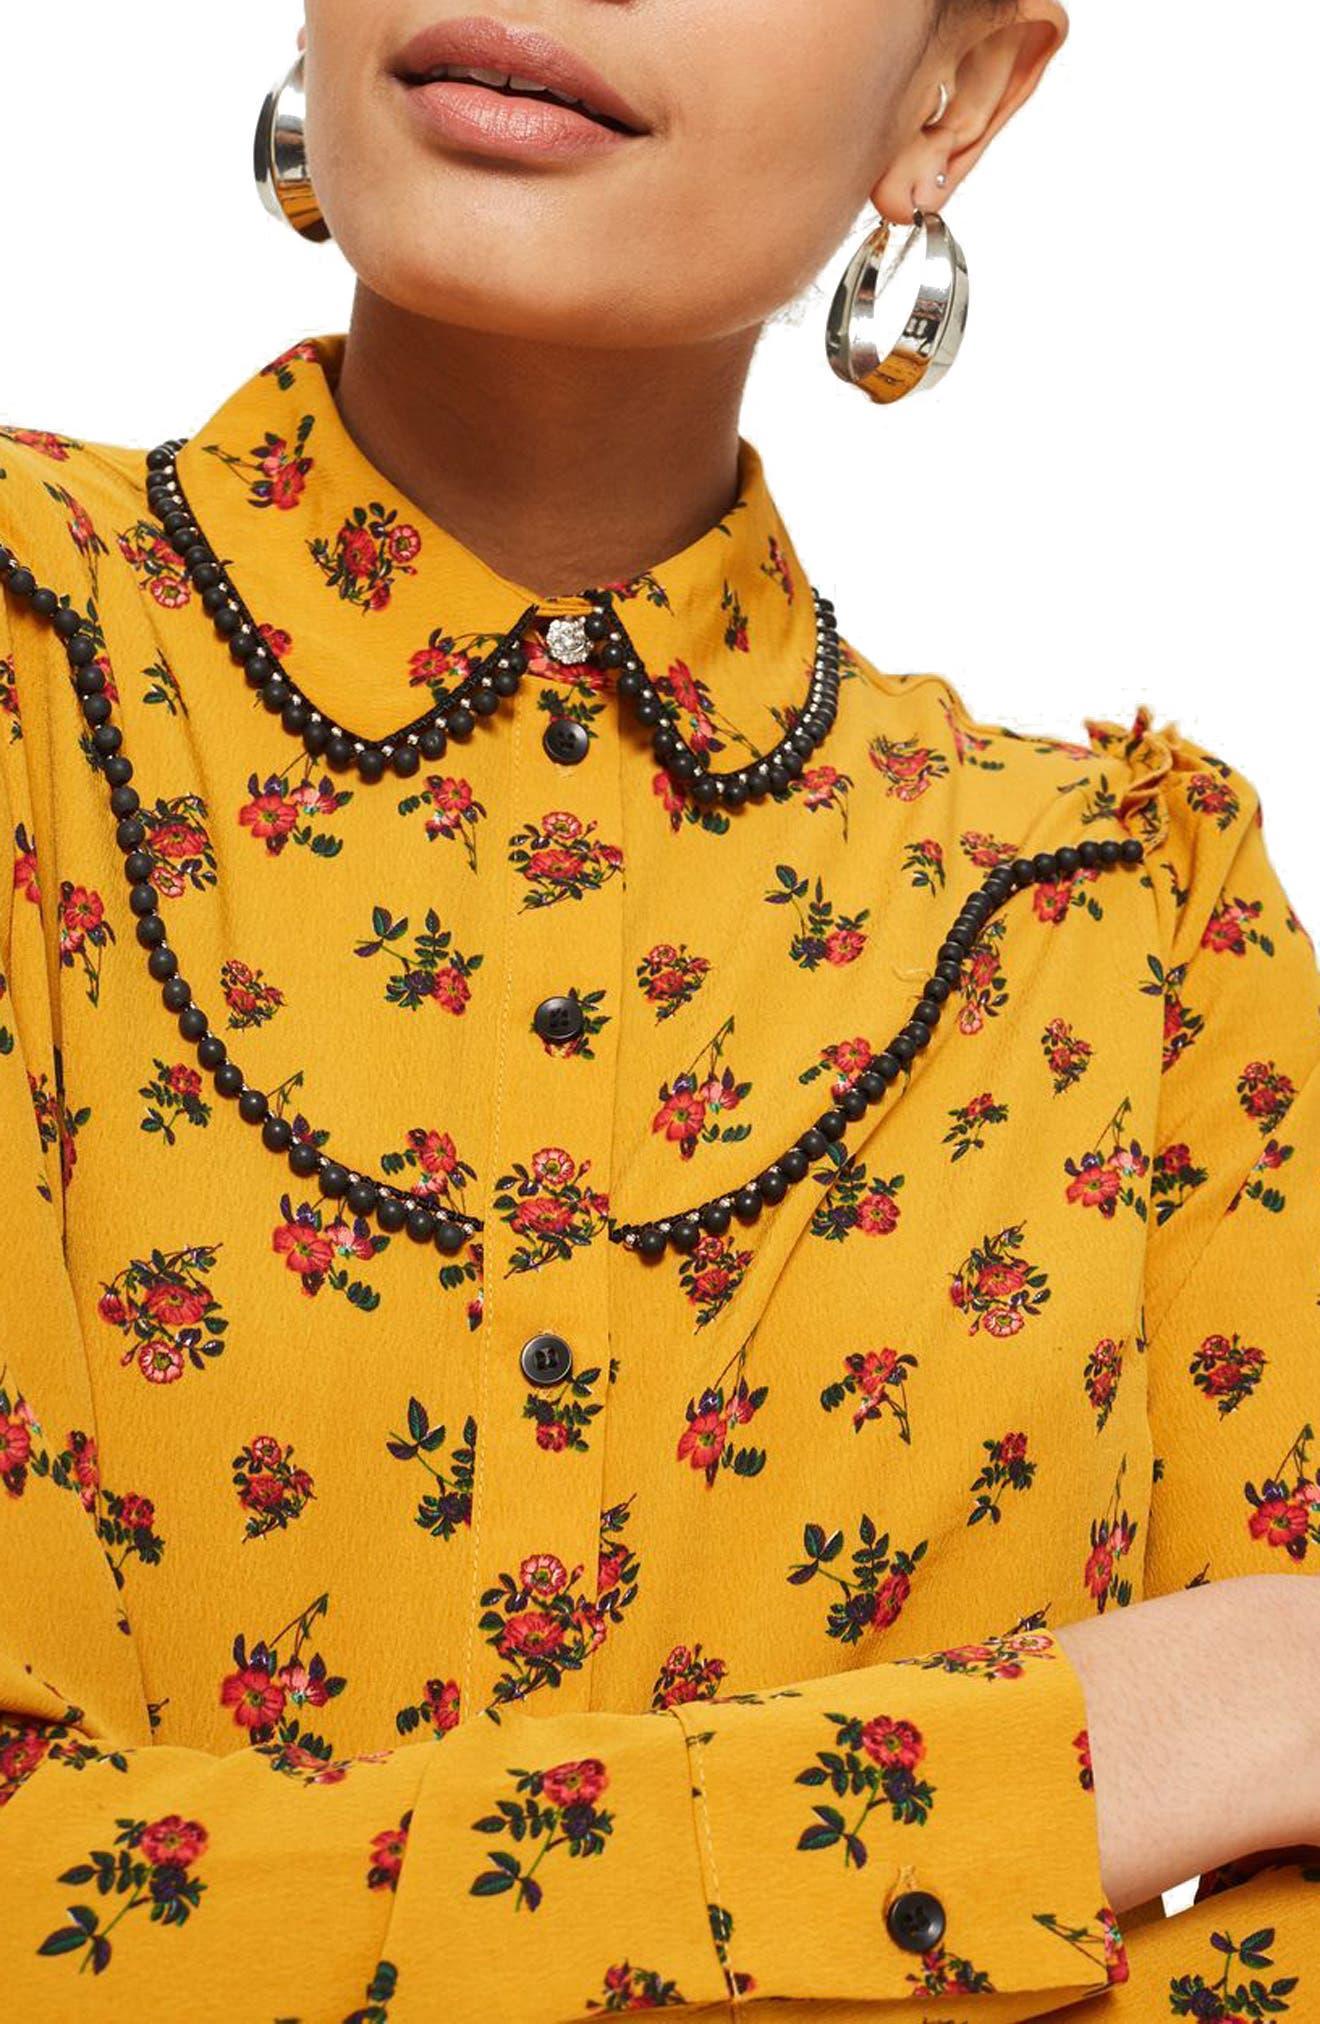 Rodeo Floral Retro Shirt,                             Alternate thumbnail 3, color,                             Mustard